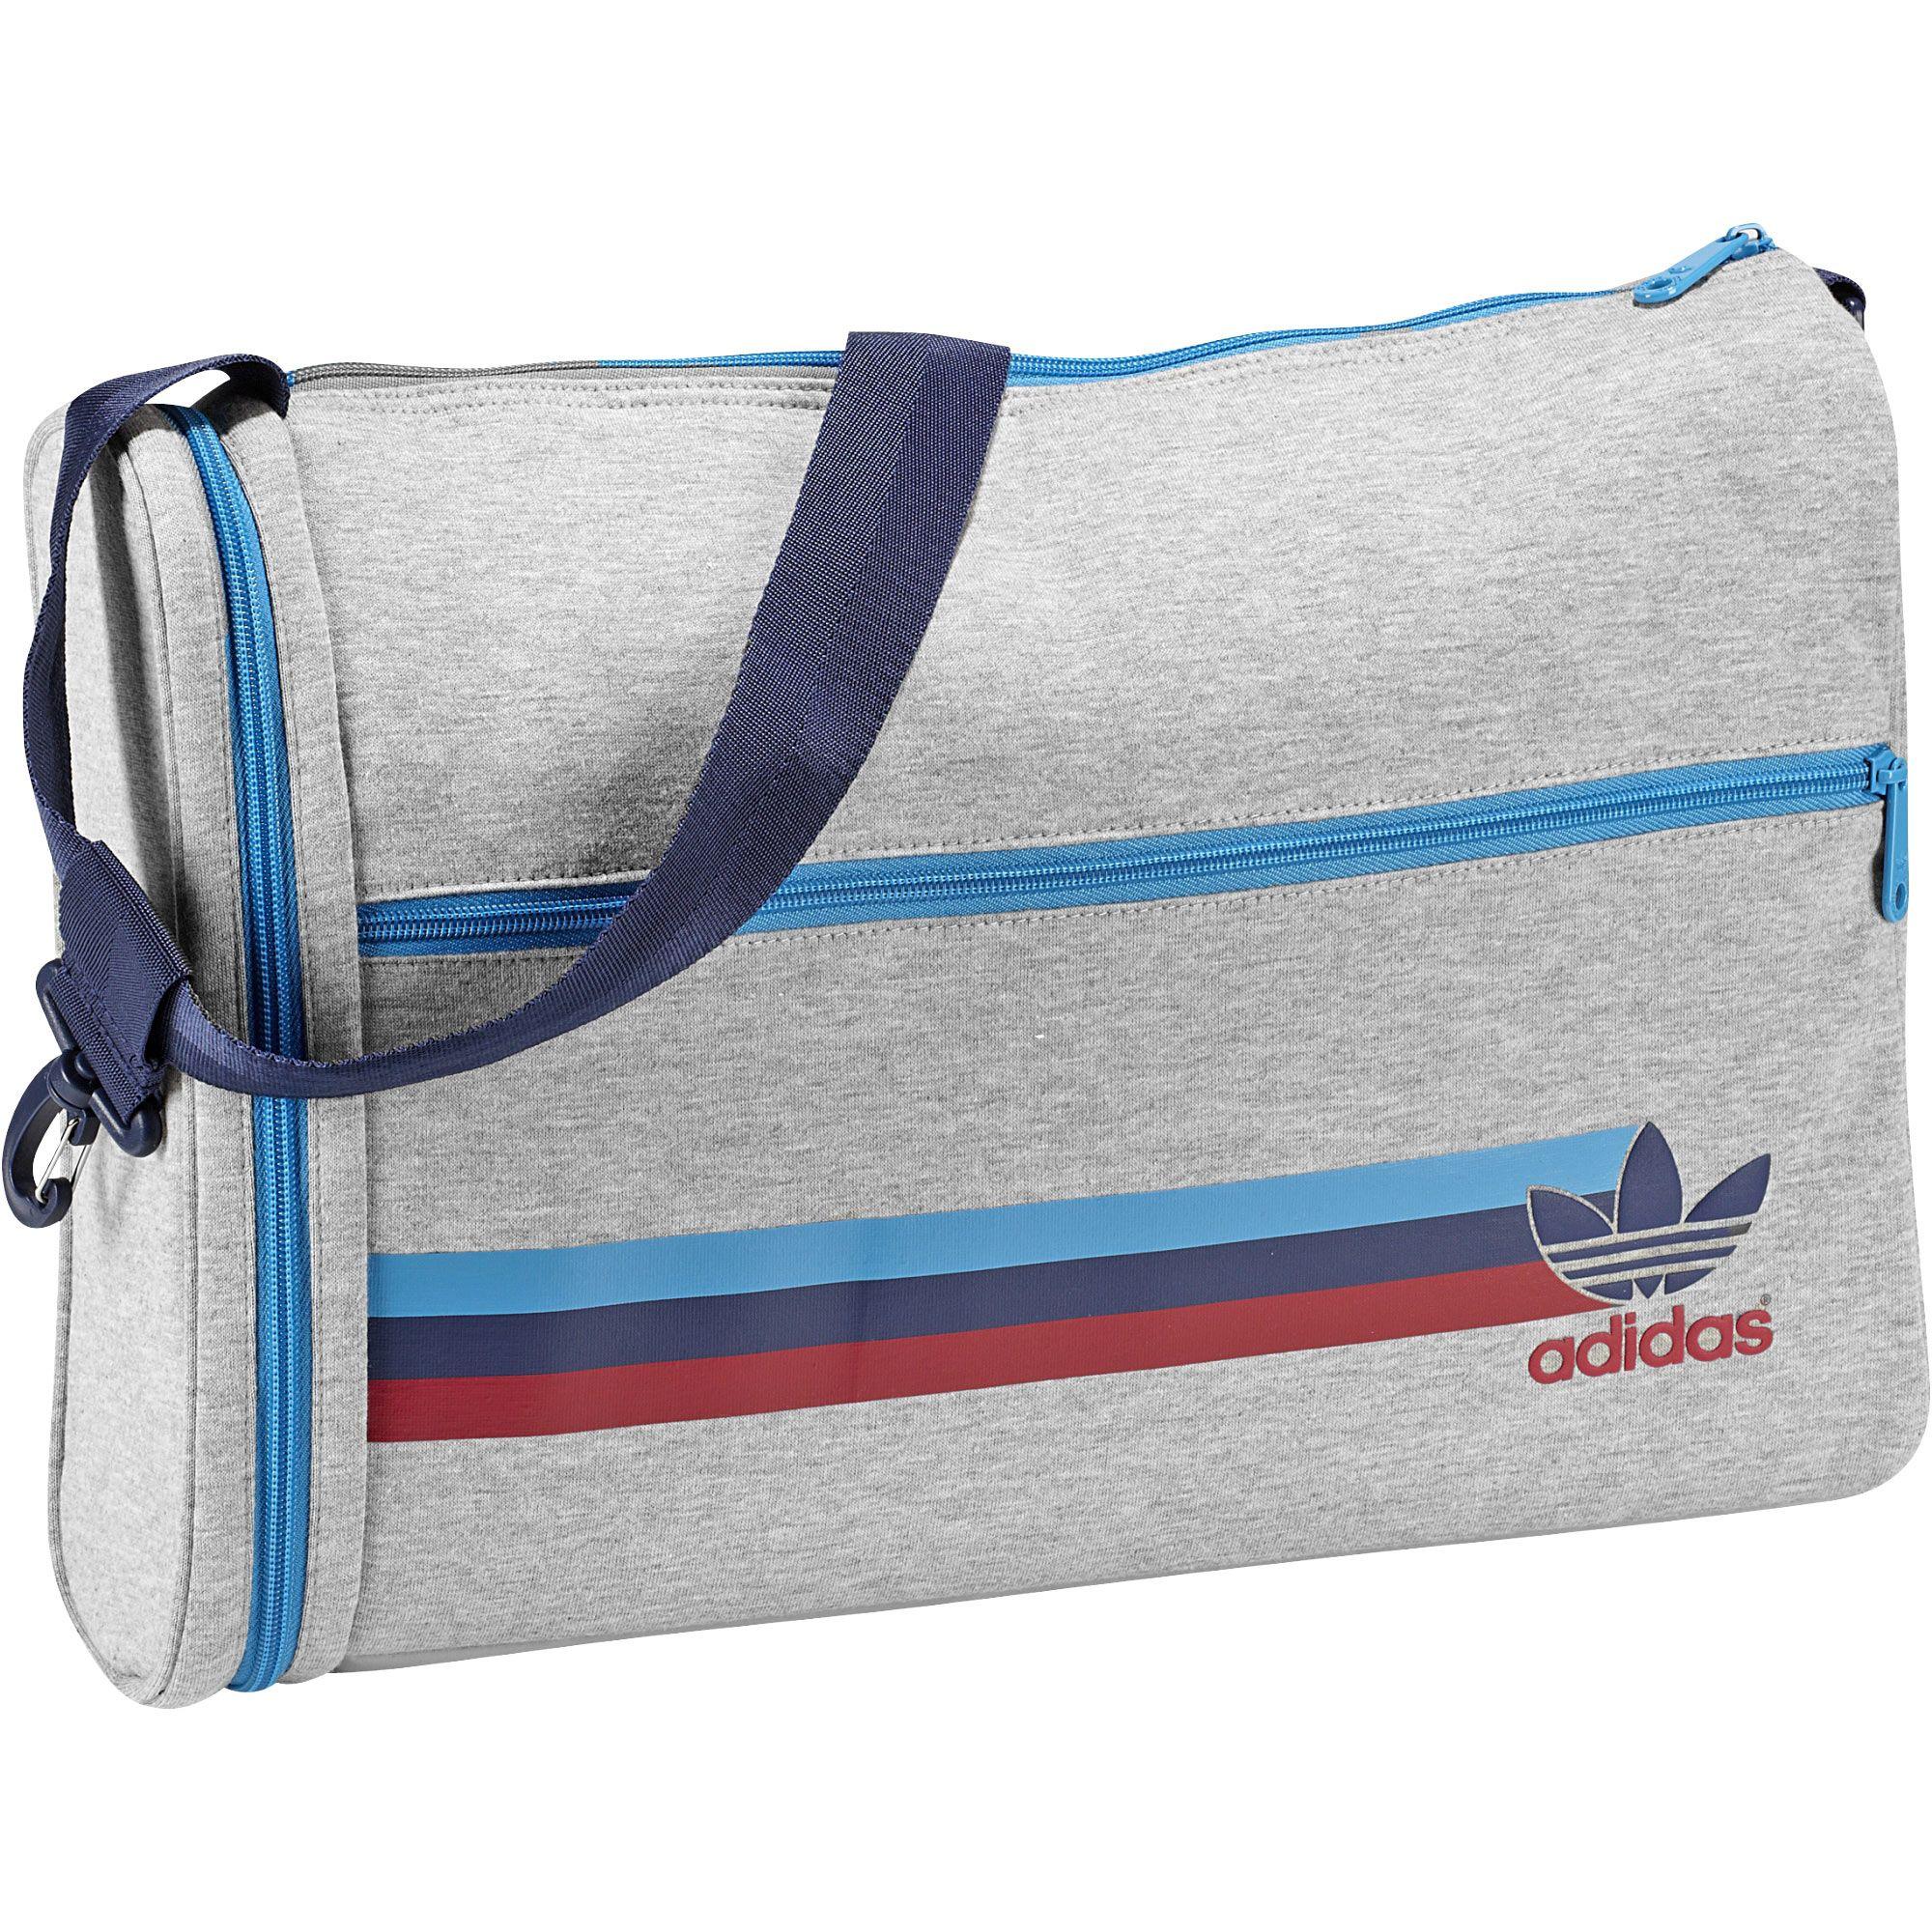 adidas Jersey Airliner 2 Shoulder Bag  4ae51618a4